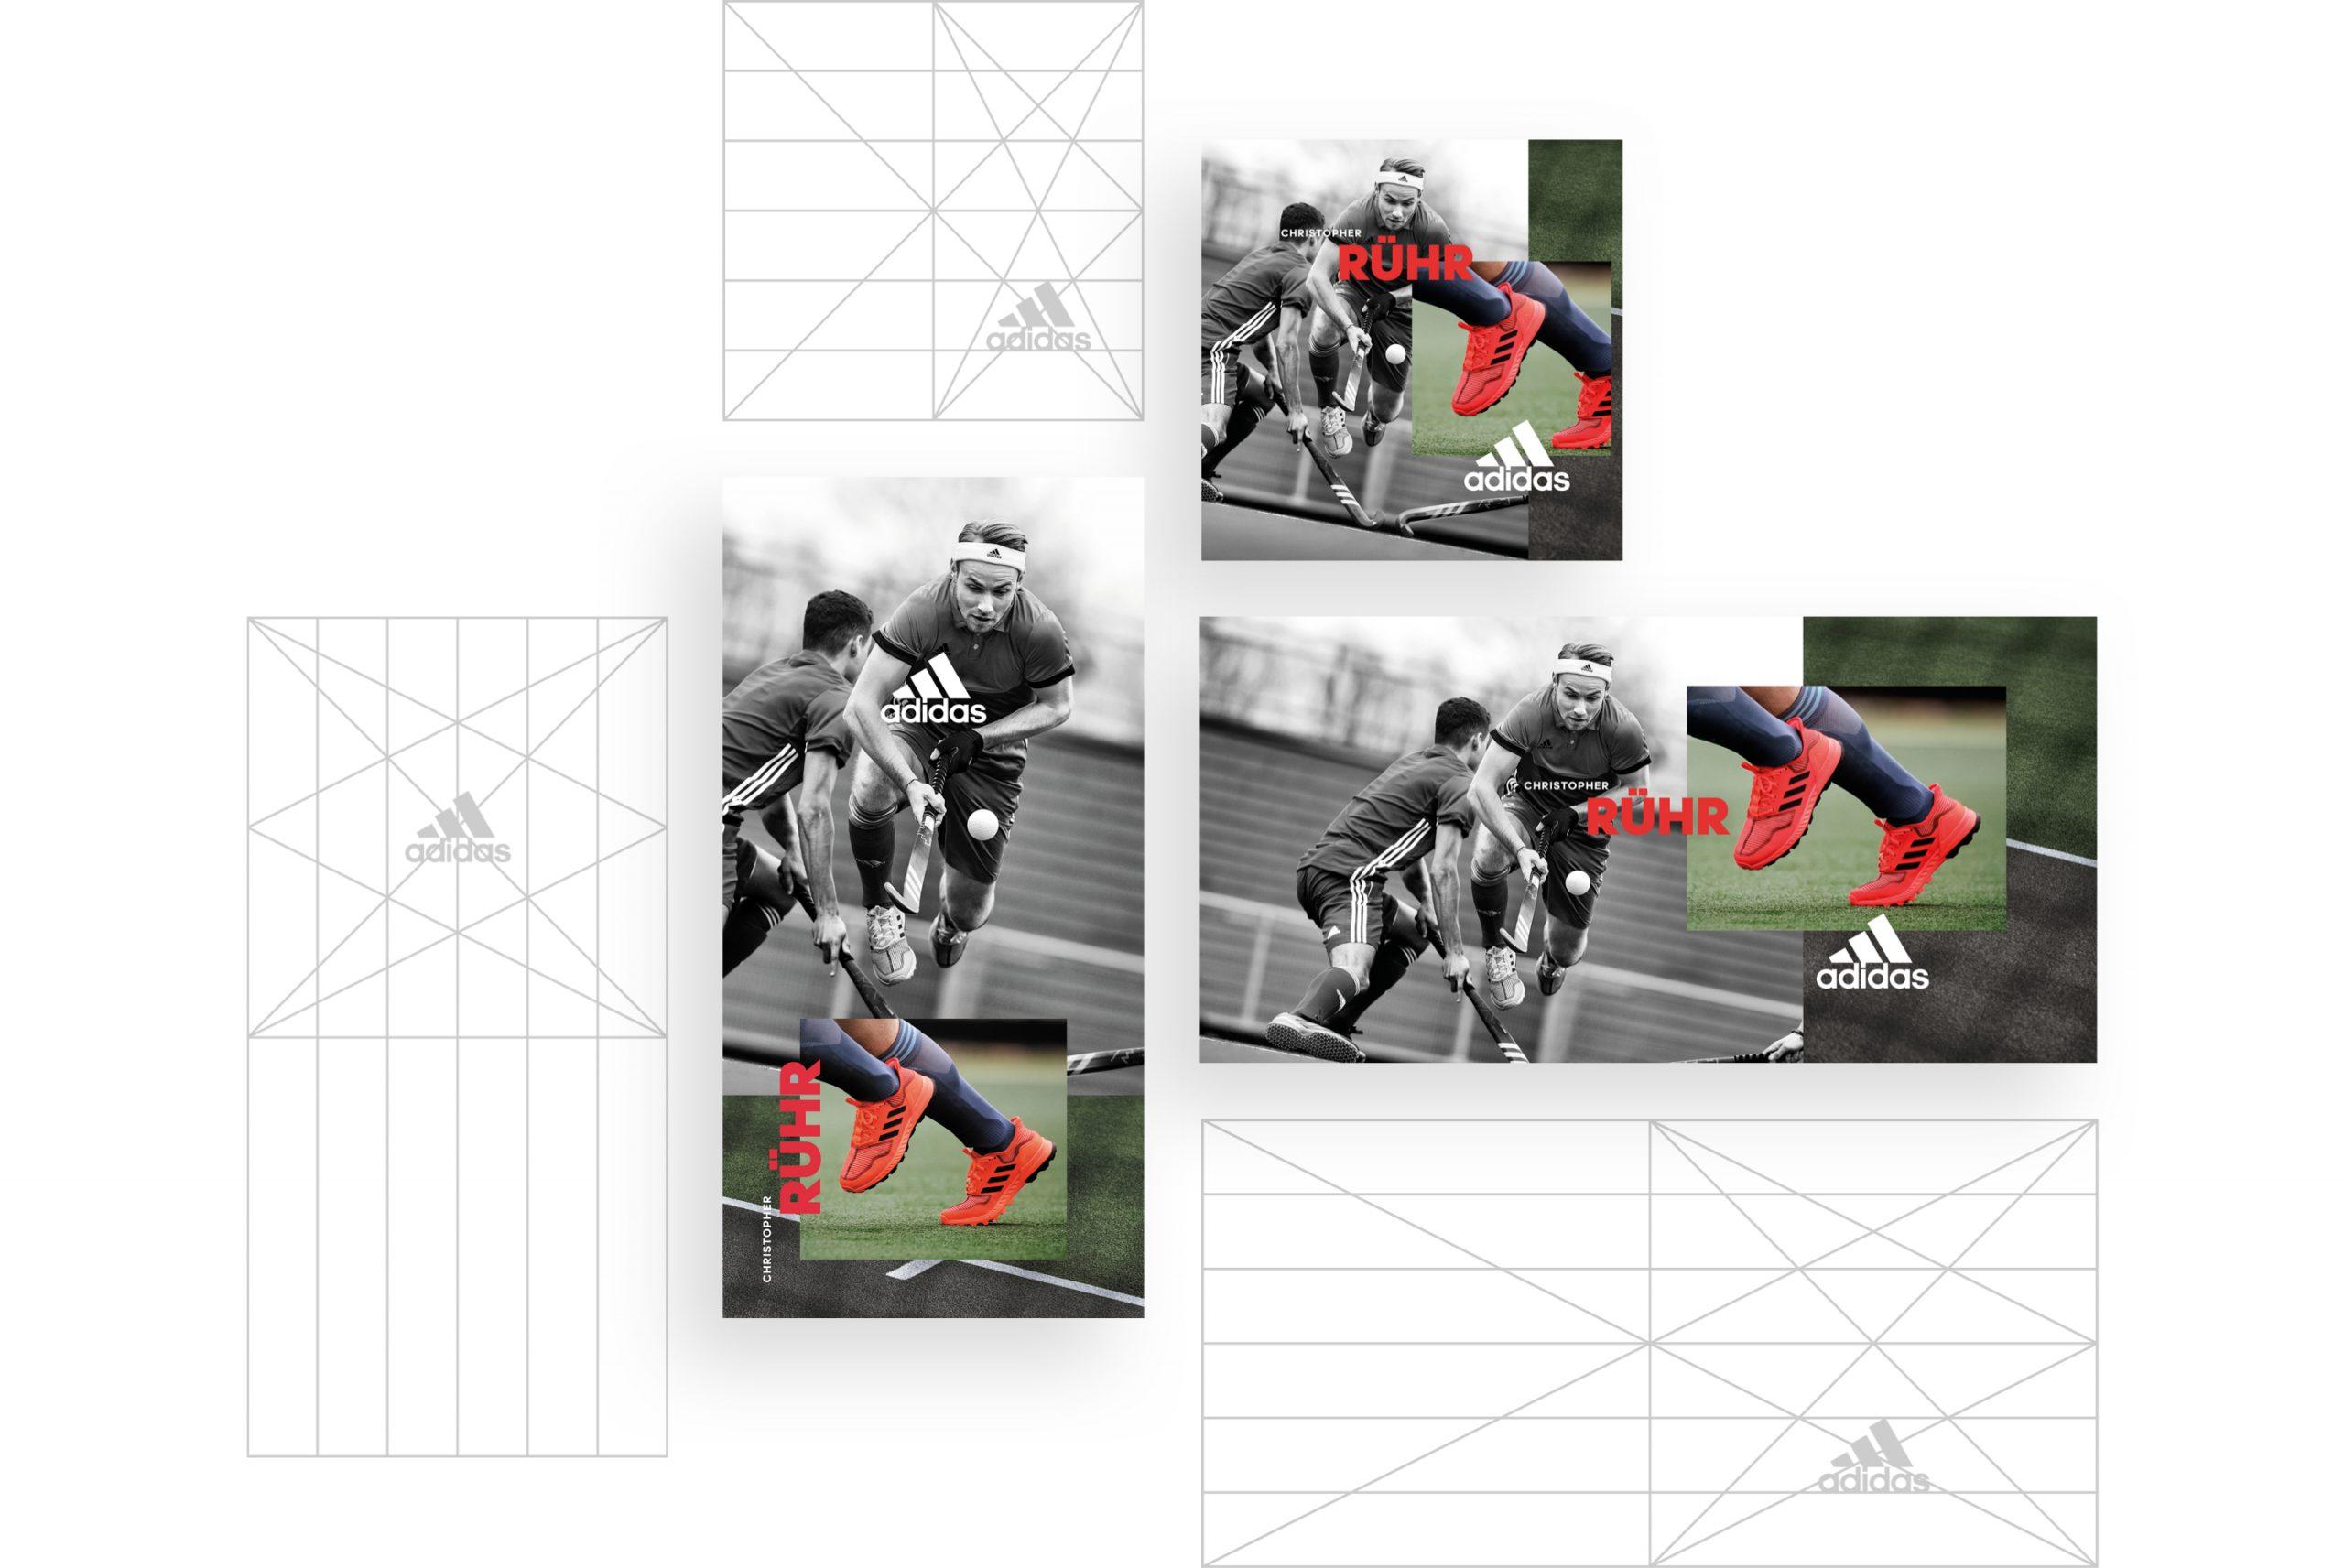 pascher-heinz-adidas-world-cup-layout-01